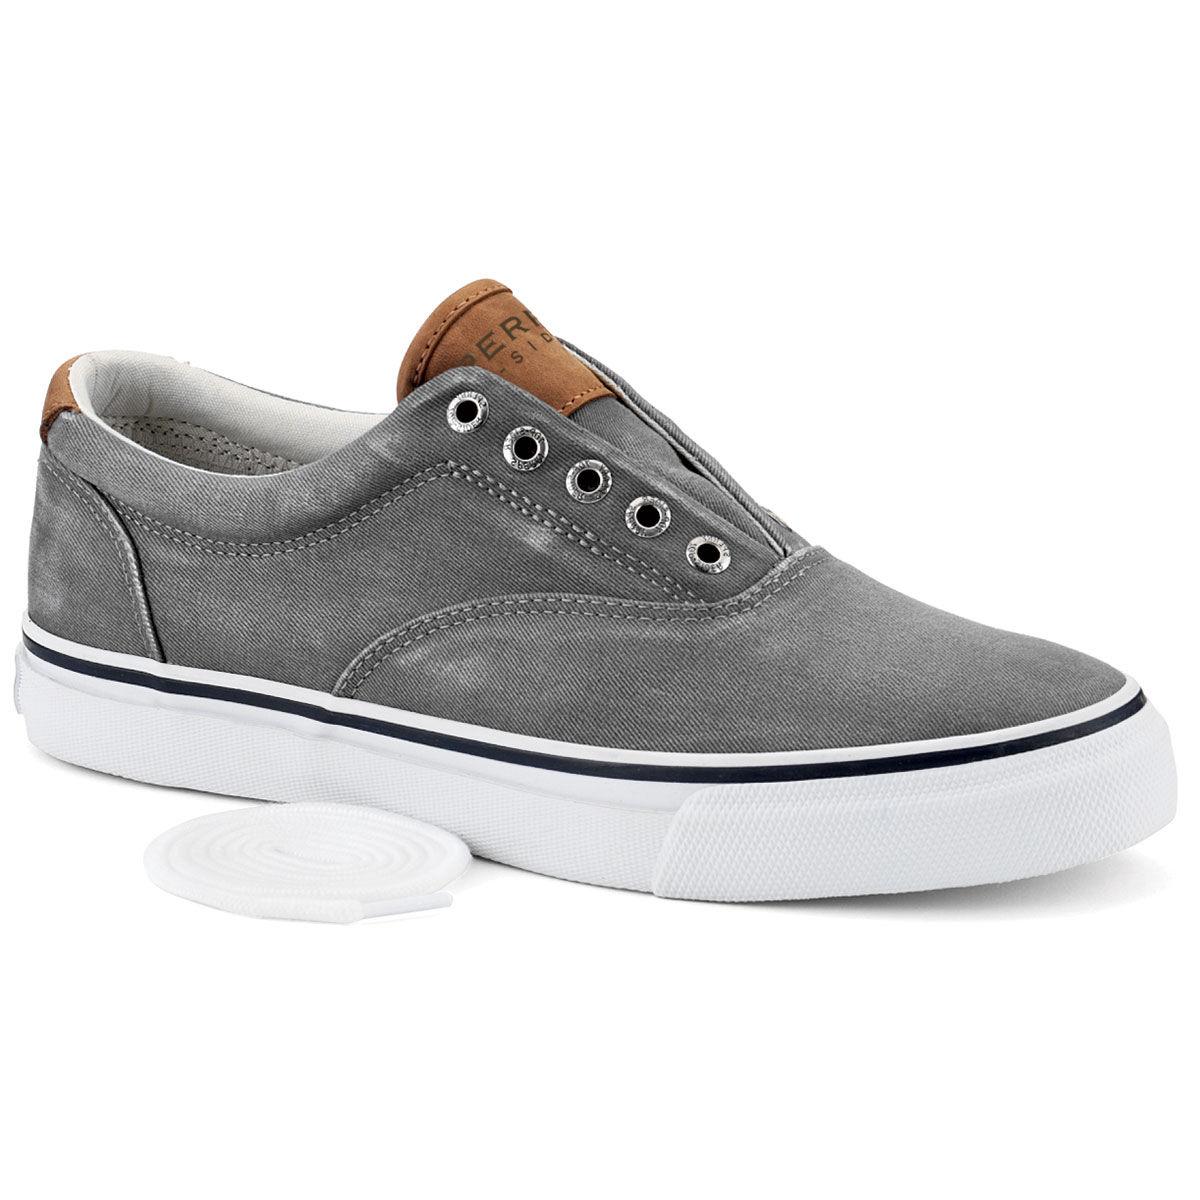 Striper CVO Salt Washed Twill Sneakers